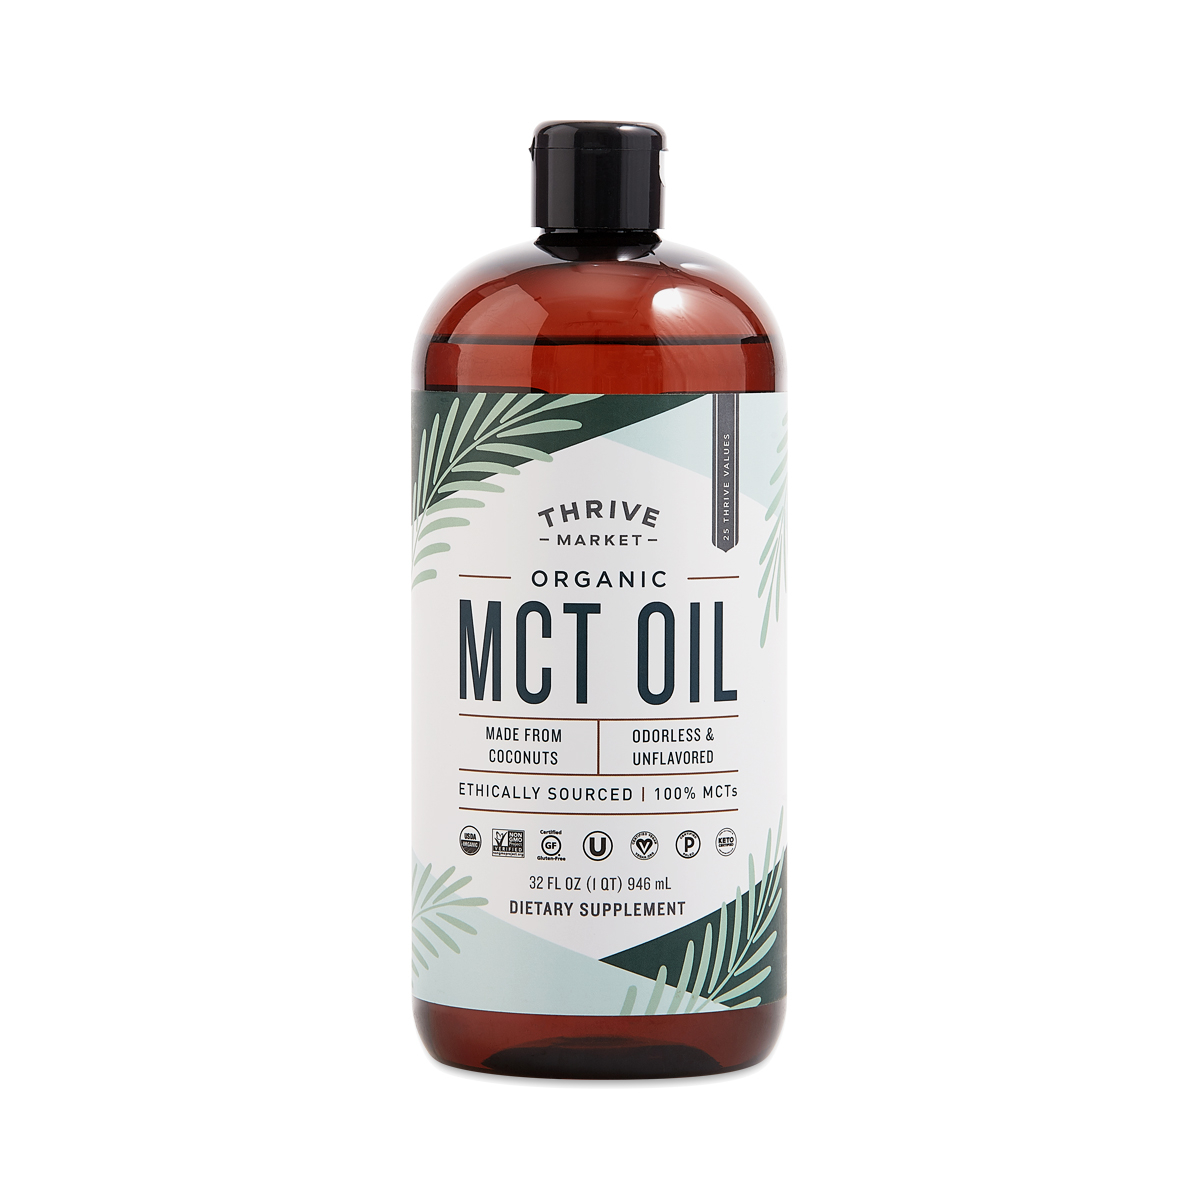 Thrive Market Organic MCT Oil 32 oz plastic bottle